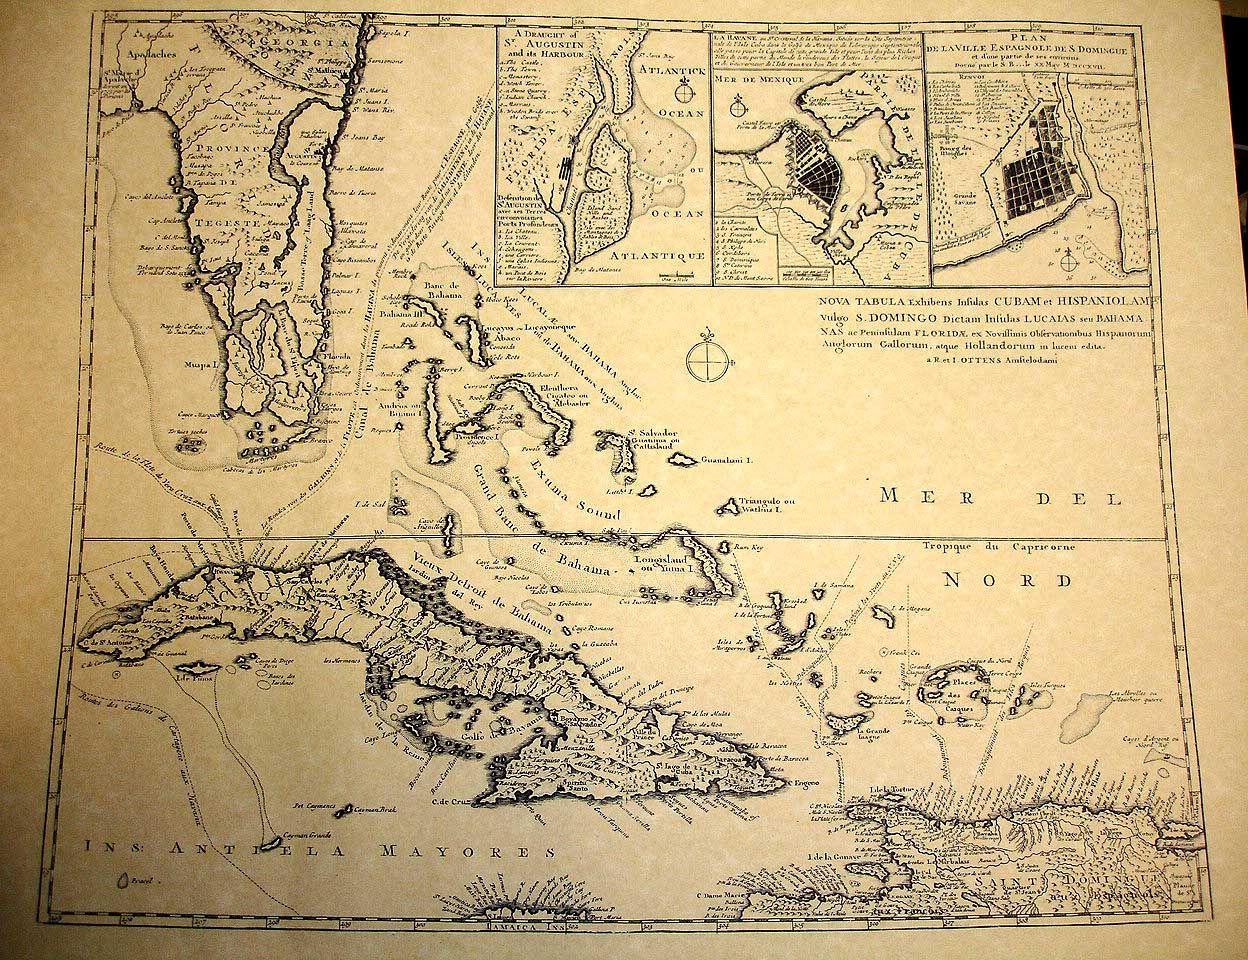 treasure maps   Treasure Maps of Florida and the West Ins ... on nature coast, fun coast, map of walt disney world area, map of florida nature coast, map of miami, space coast, map of florida west coast, big bend, north florida, martin county, map of florida emerald coast, gold coast, alex webster, map of florida space coast, st. lucie county, emerald coast, map of fort lauderdale, the forgotten coast, map of florida east coast, map of florida gulf coast beaches, southwest florida, indian river county, north central florida, vero beach, map of boca raton, first coast, central florida, florida keys, florida panhandle, florida heartland,